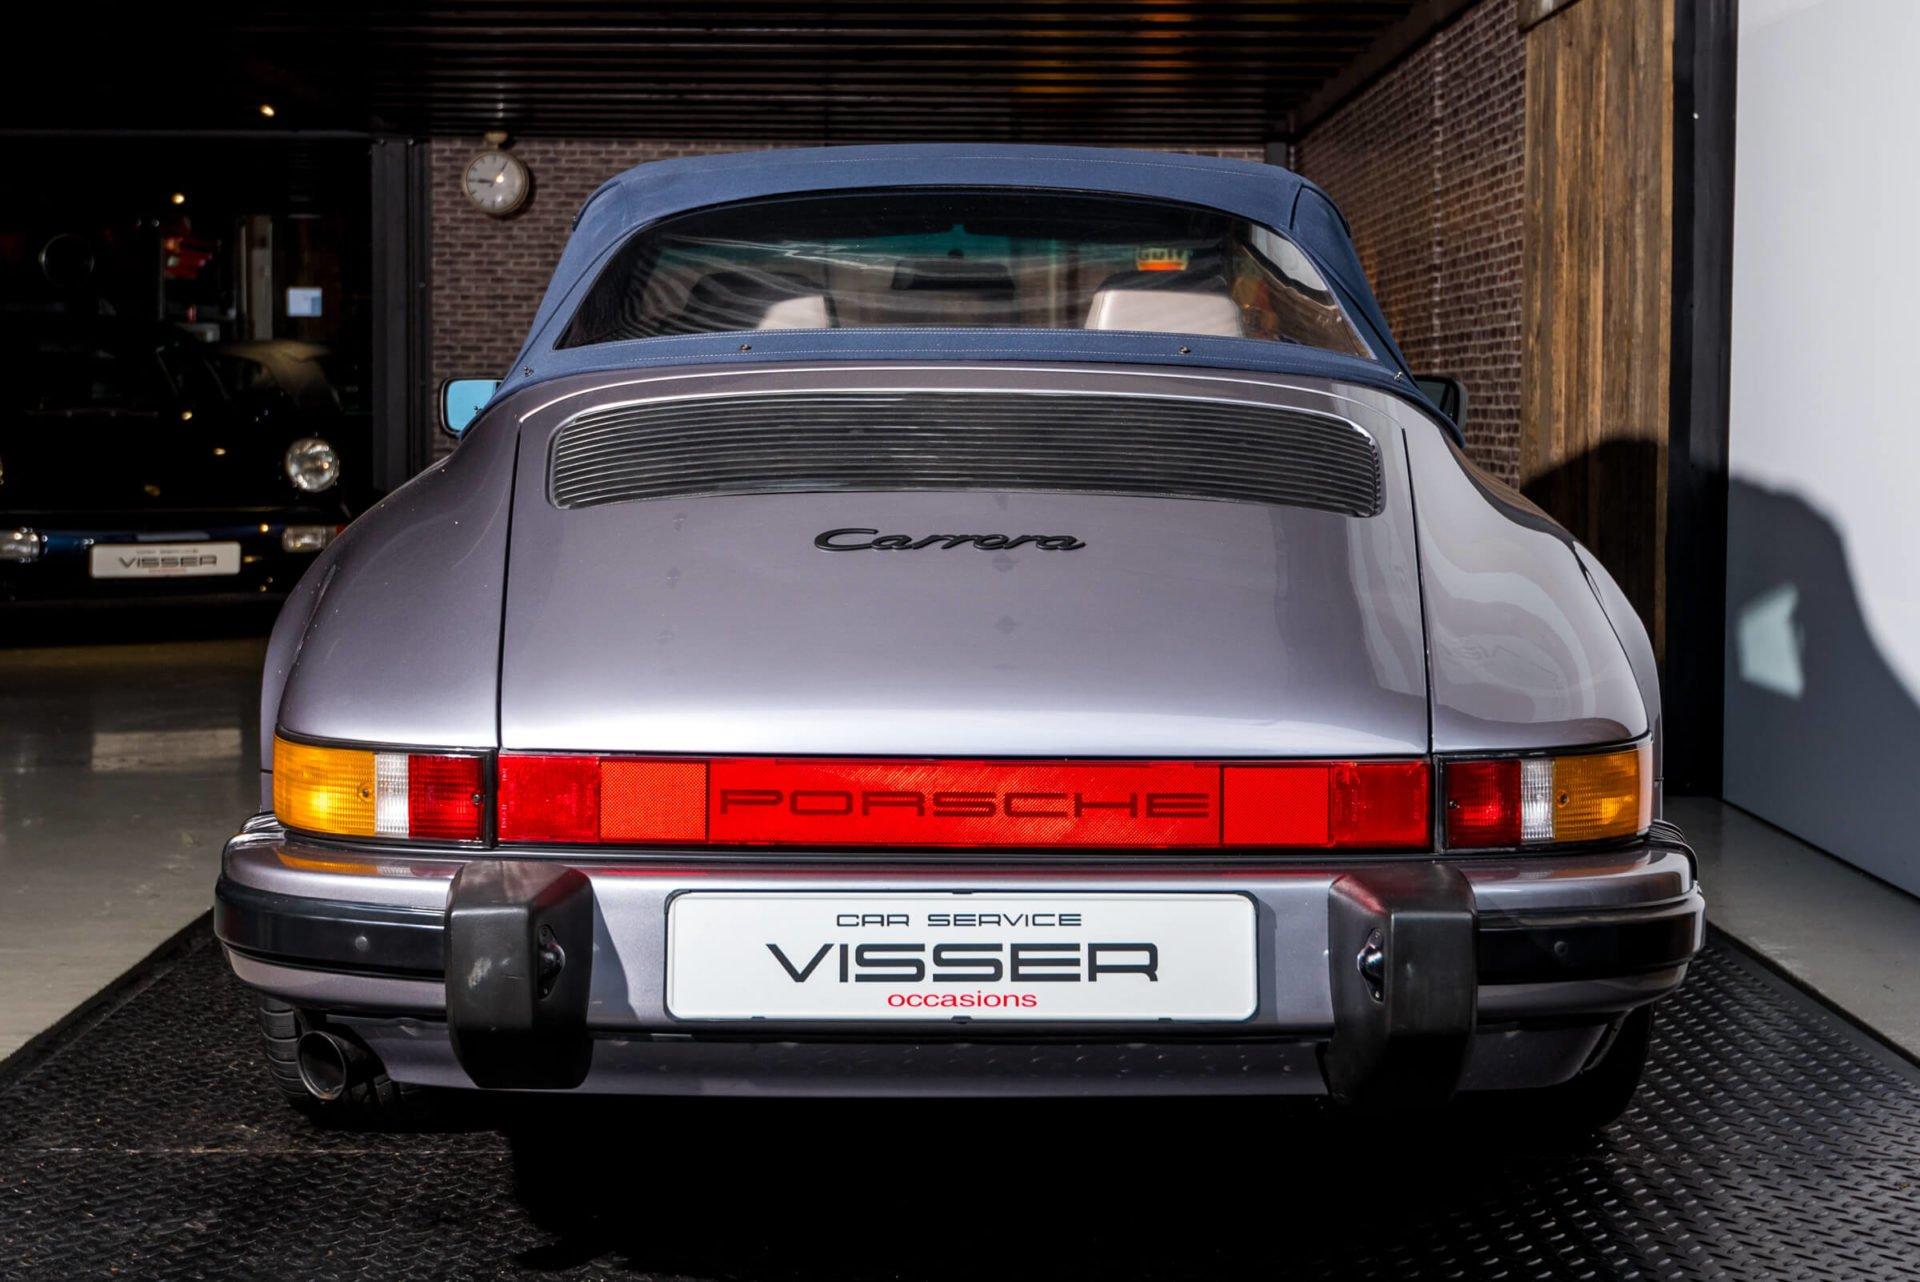 1. Porsche 3.2 Carrera 6